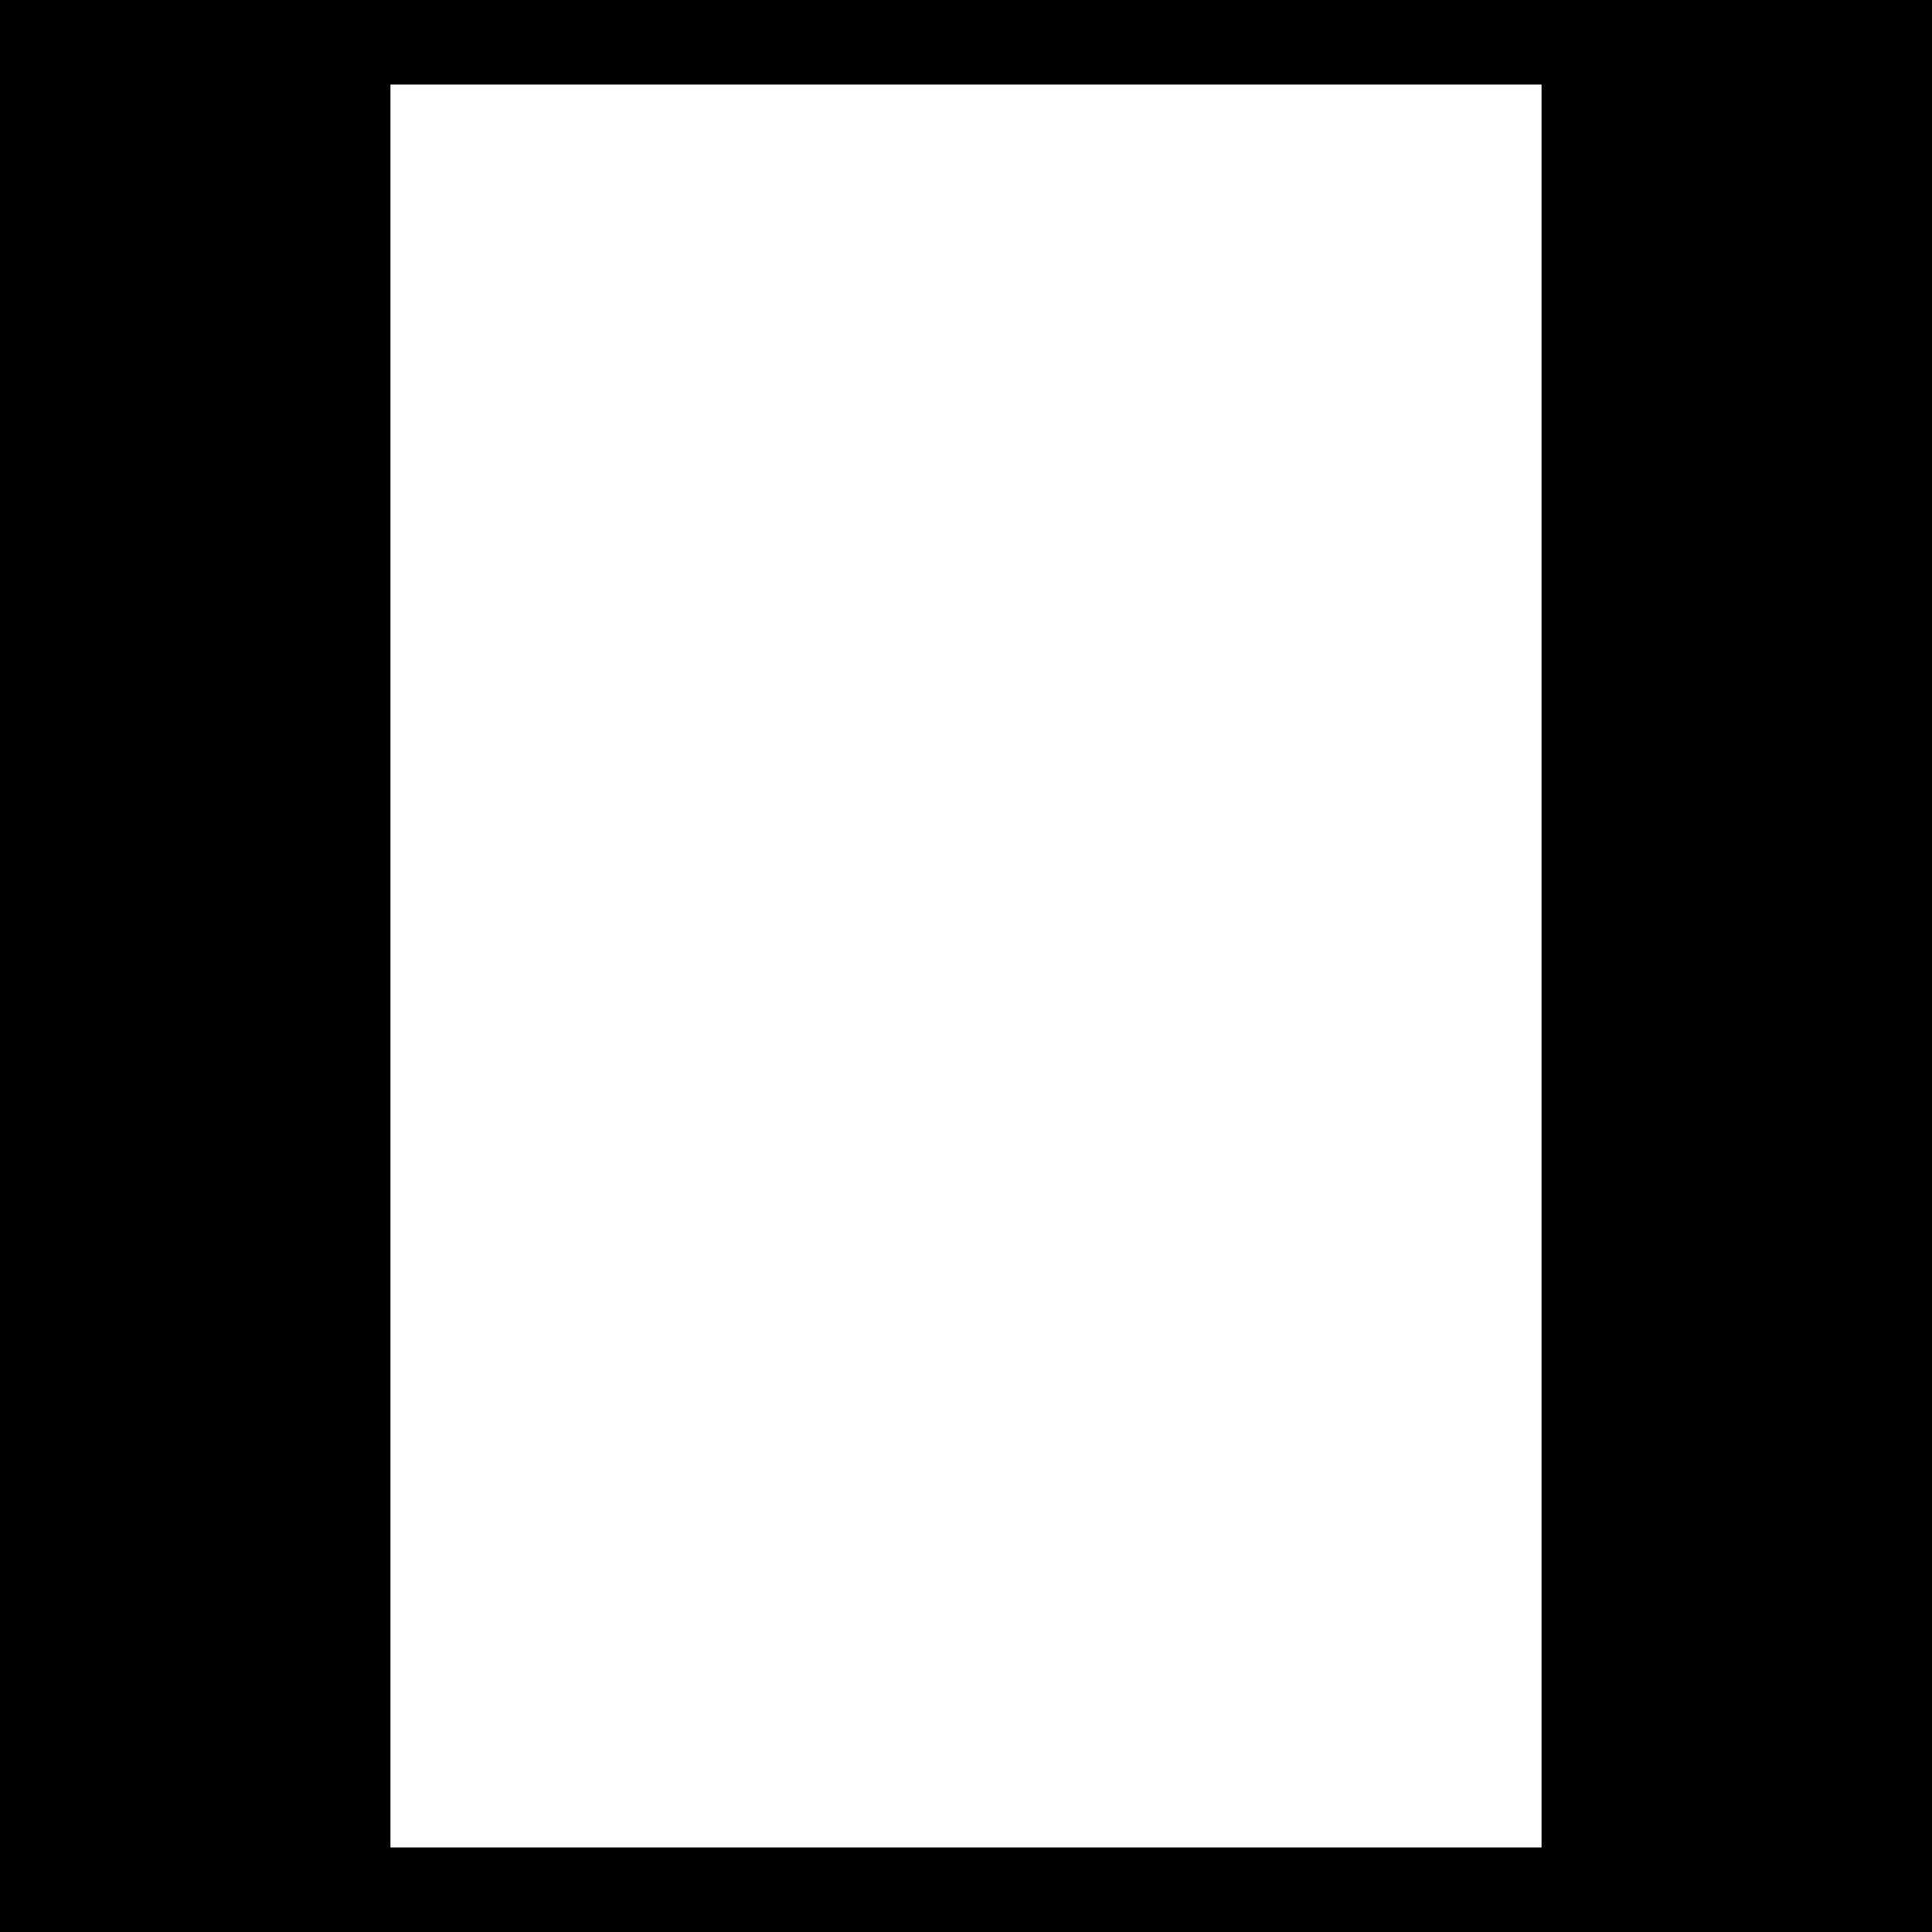 Liverpool Fc Logo Transparent